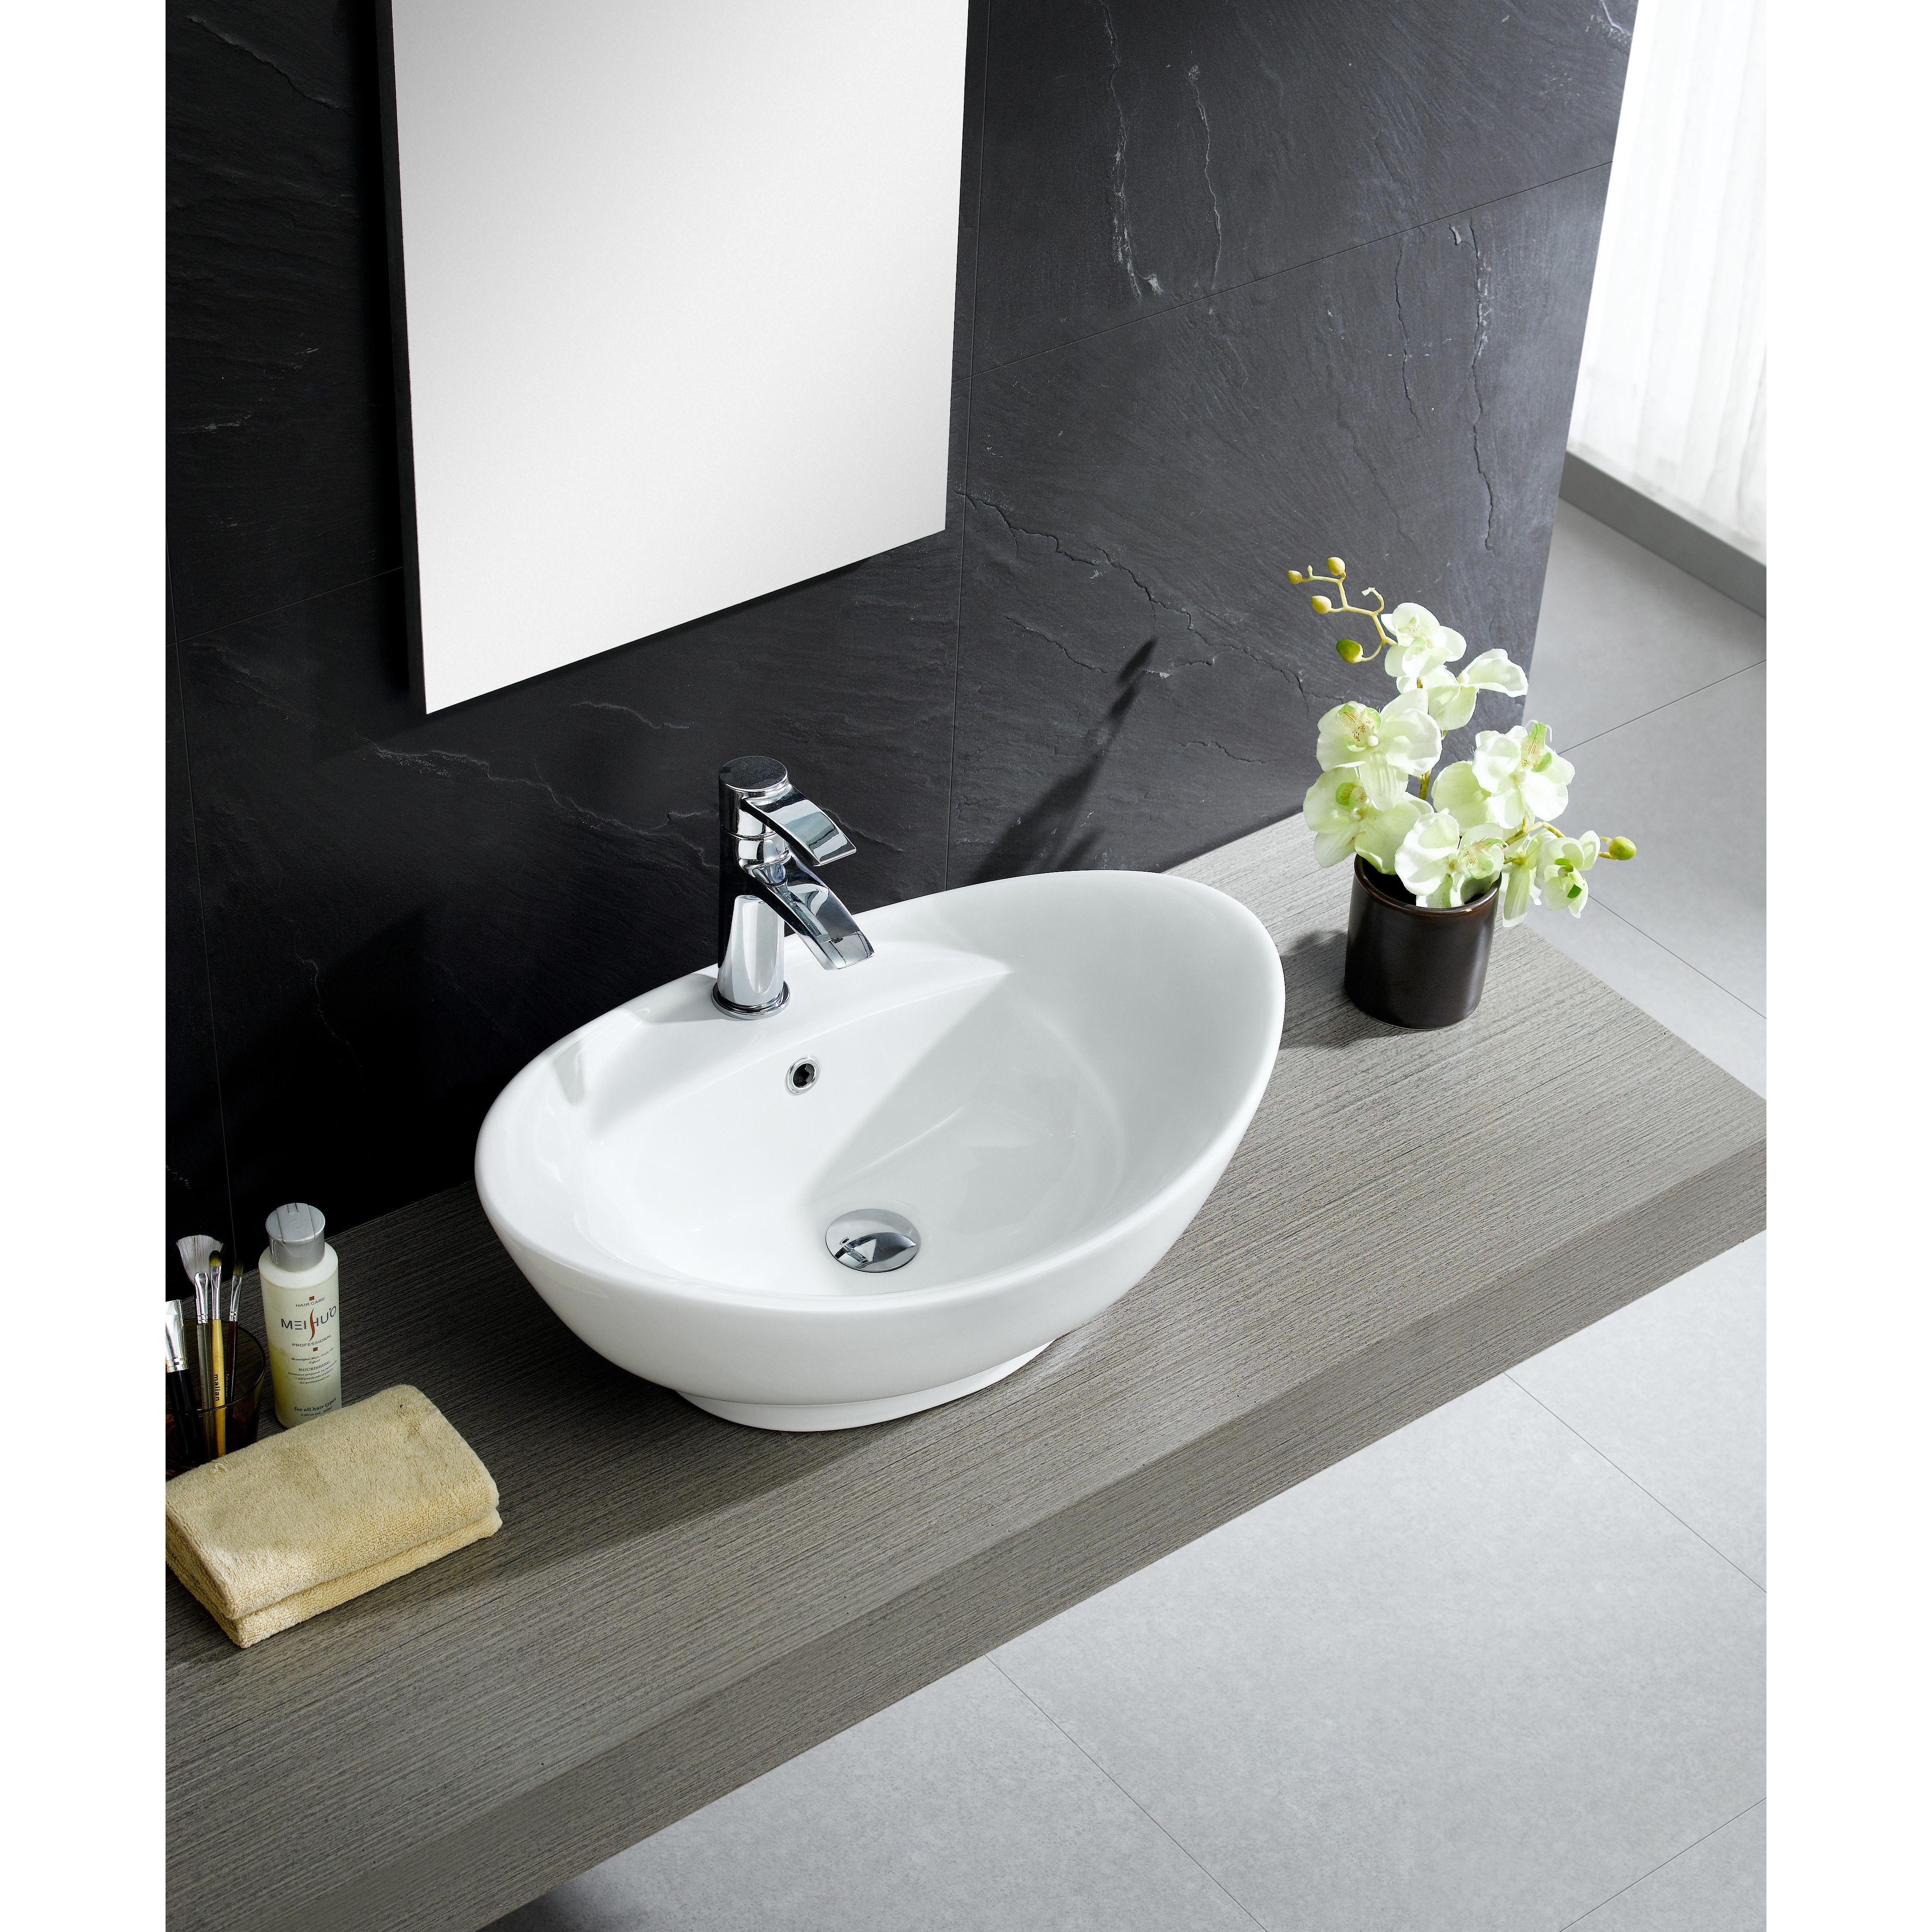 Modern Glossy White Ceramic Oval Vessel Bathroom Sink Modern Bathroom Sink Modern Sink White Vessel Sink